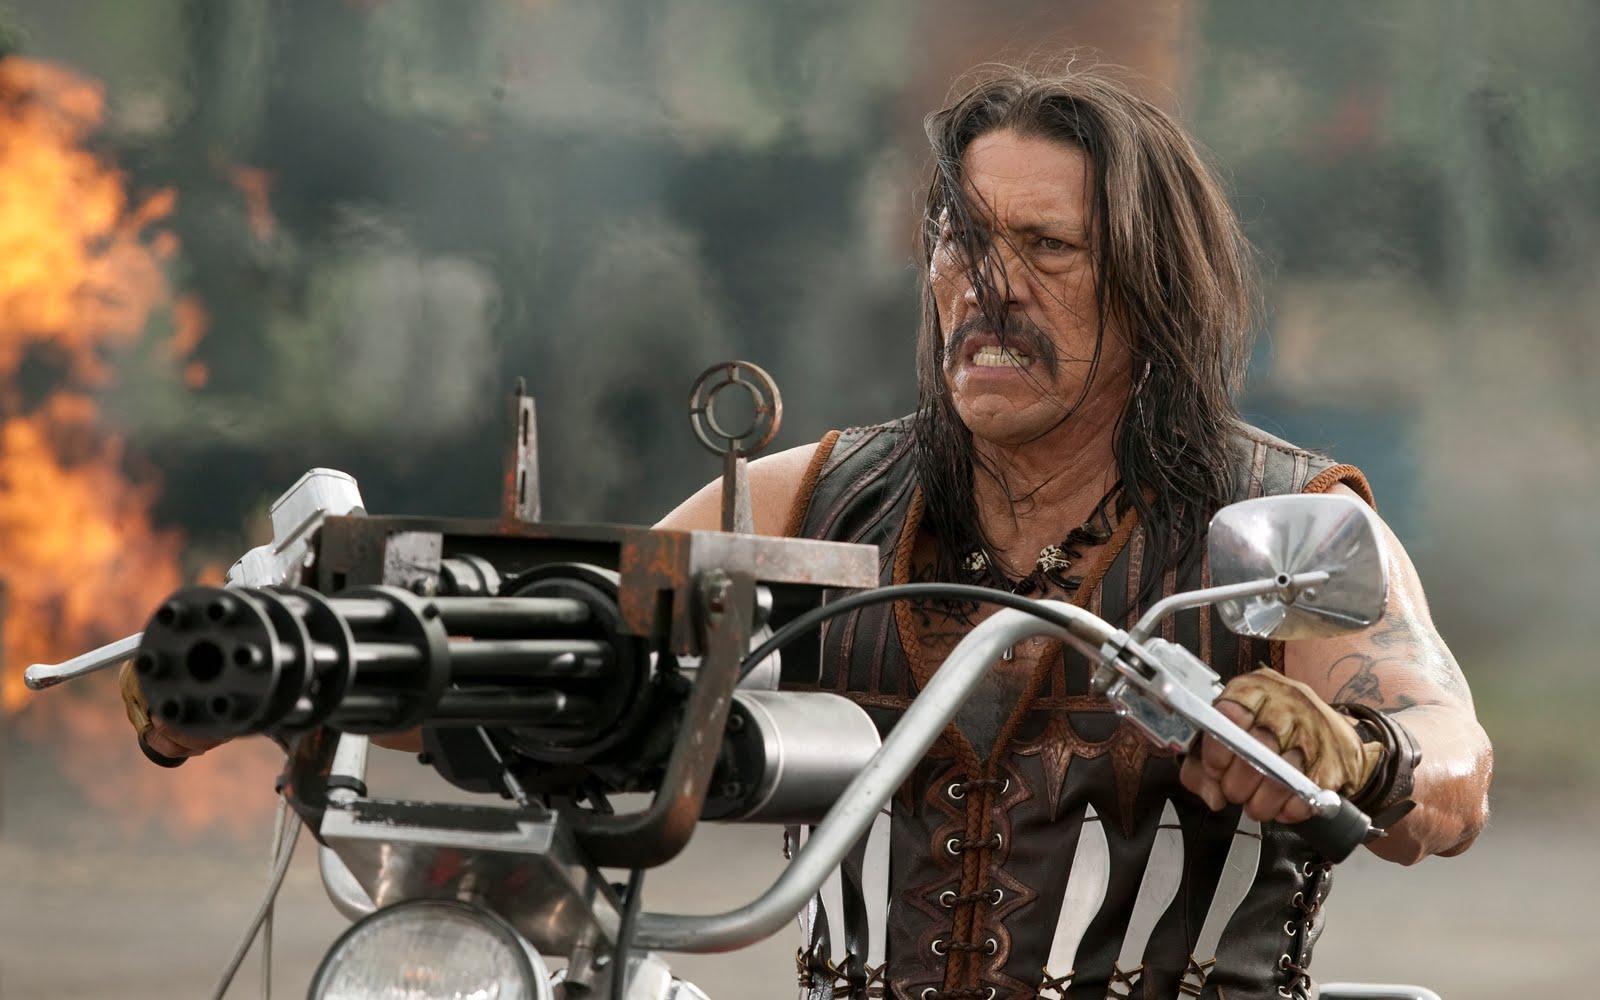 Machete Danny Trejo Machete Kills Action Movies